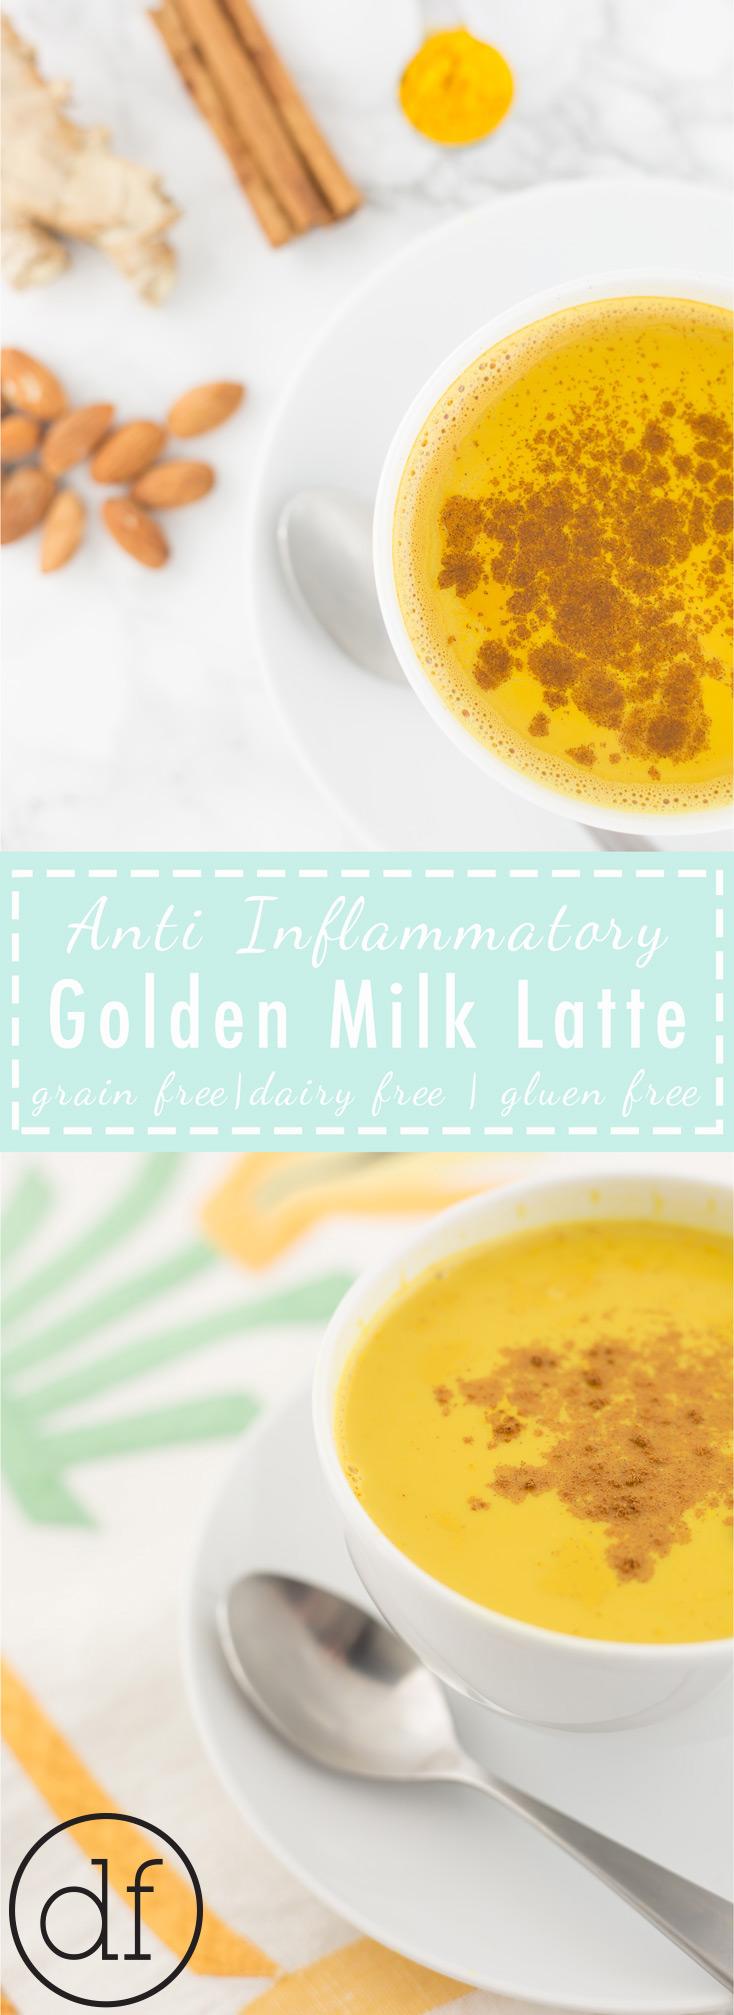 Golden Milk Latte, Anti Inflammatory, Turmeric Latte, Curcumin, Golden Milk Tea, paleo, Recipes, Easy, Simple, Bedtime Tea, Define Fettle, Health Coach